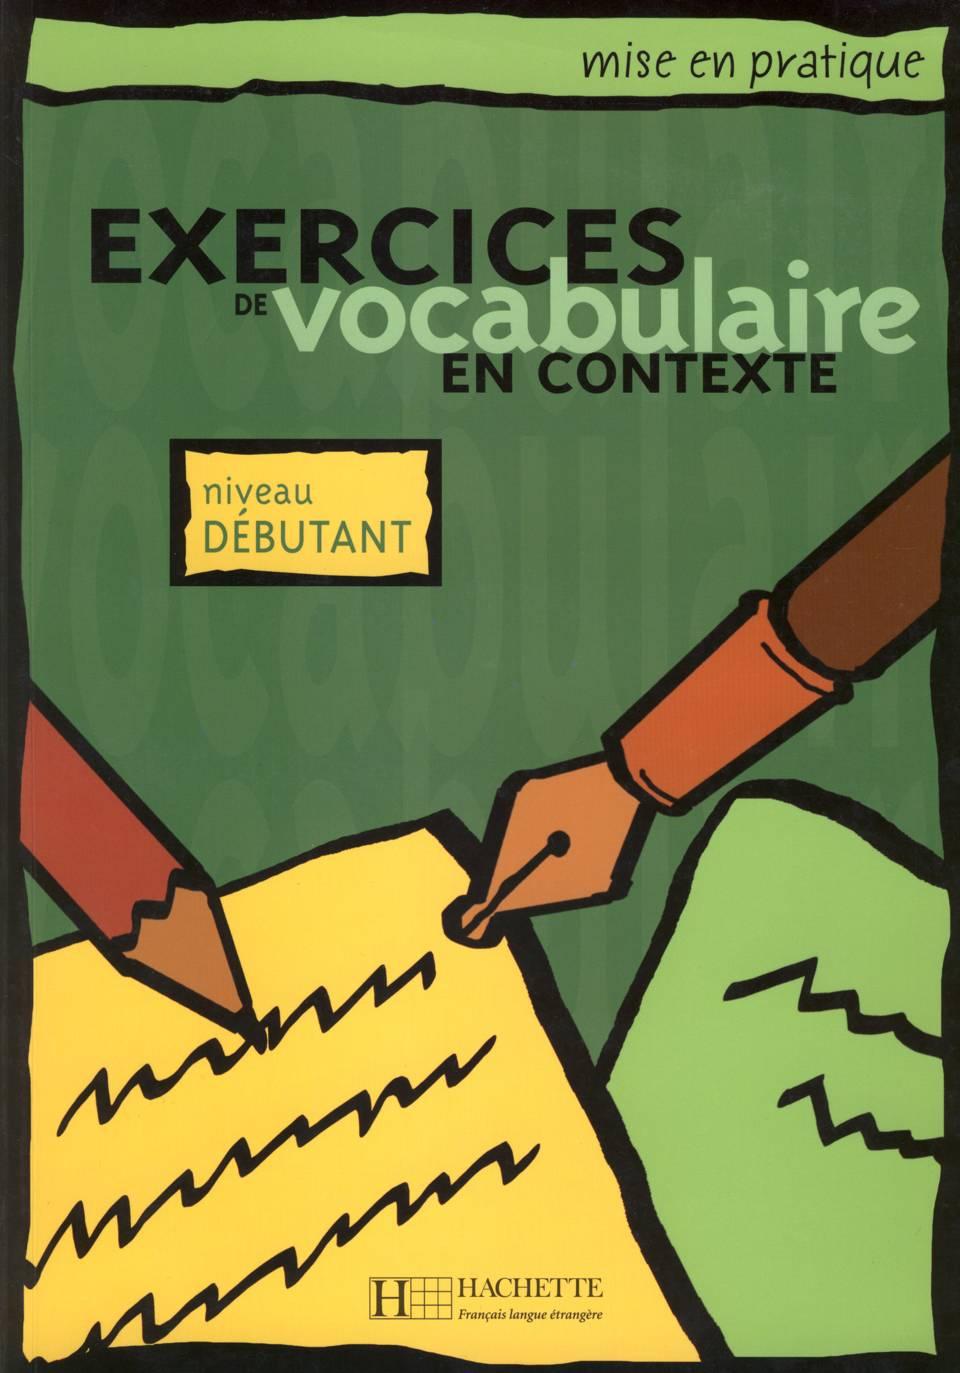 Exercices en Vocabulaire